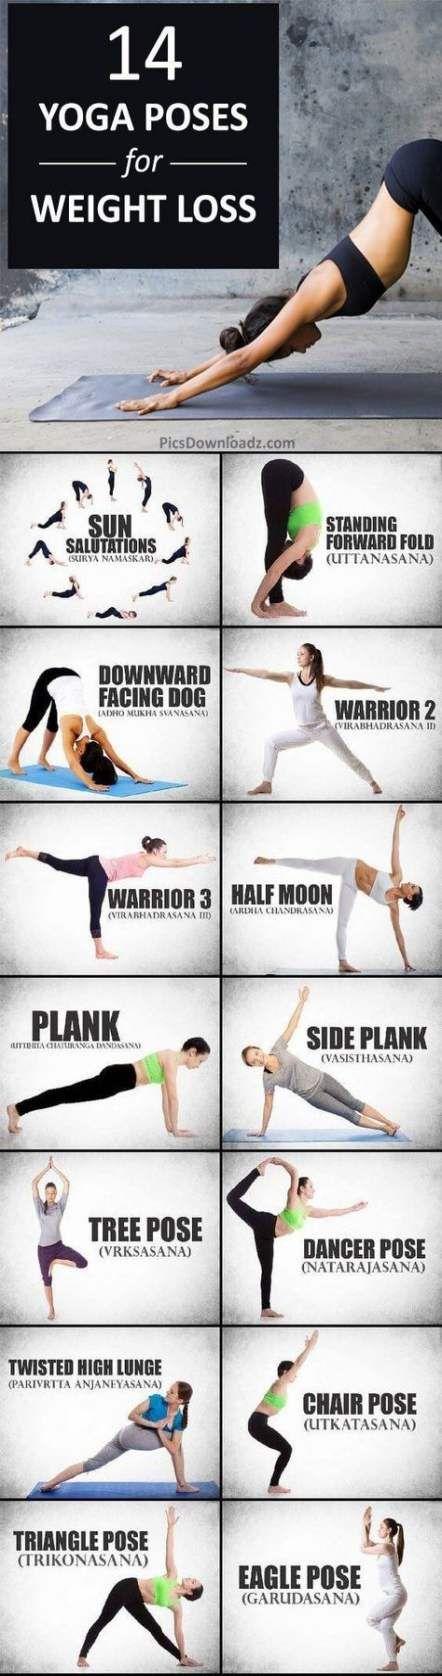 45 ideas fitness motivation ideas losing weight #motivation #fitness